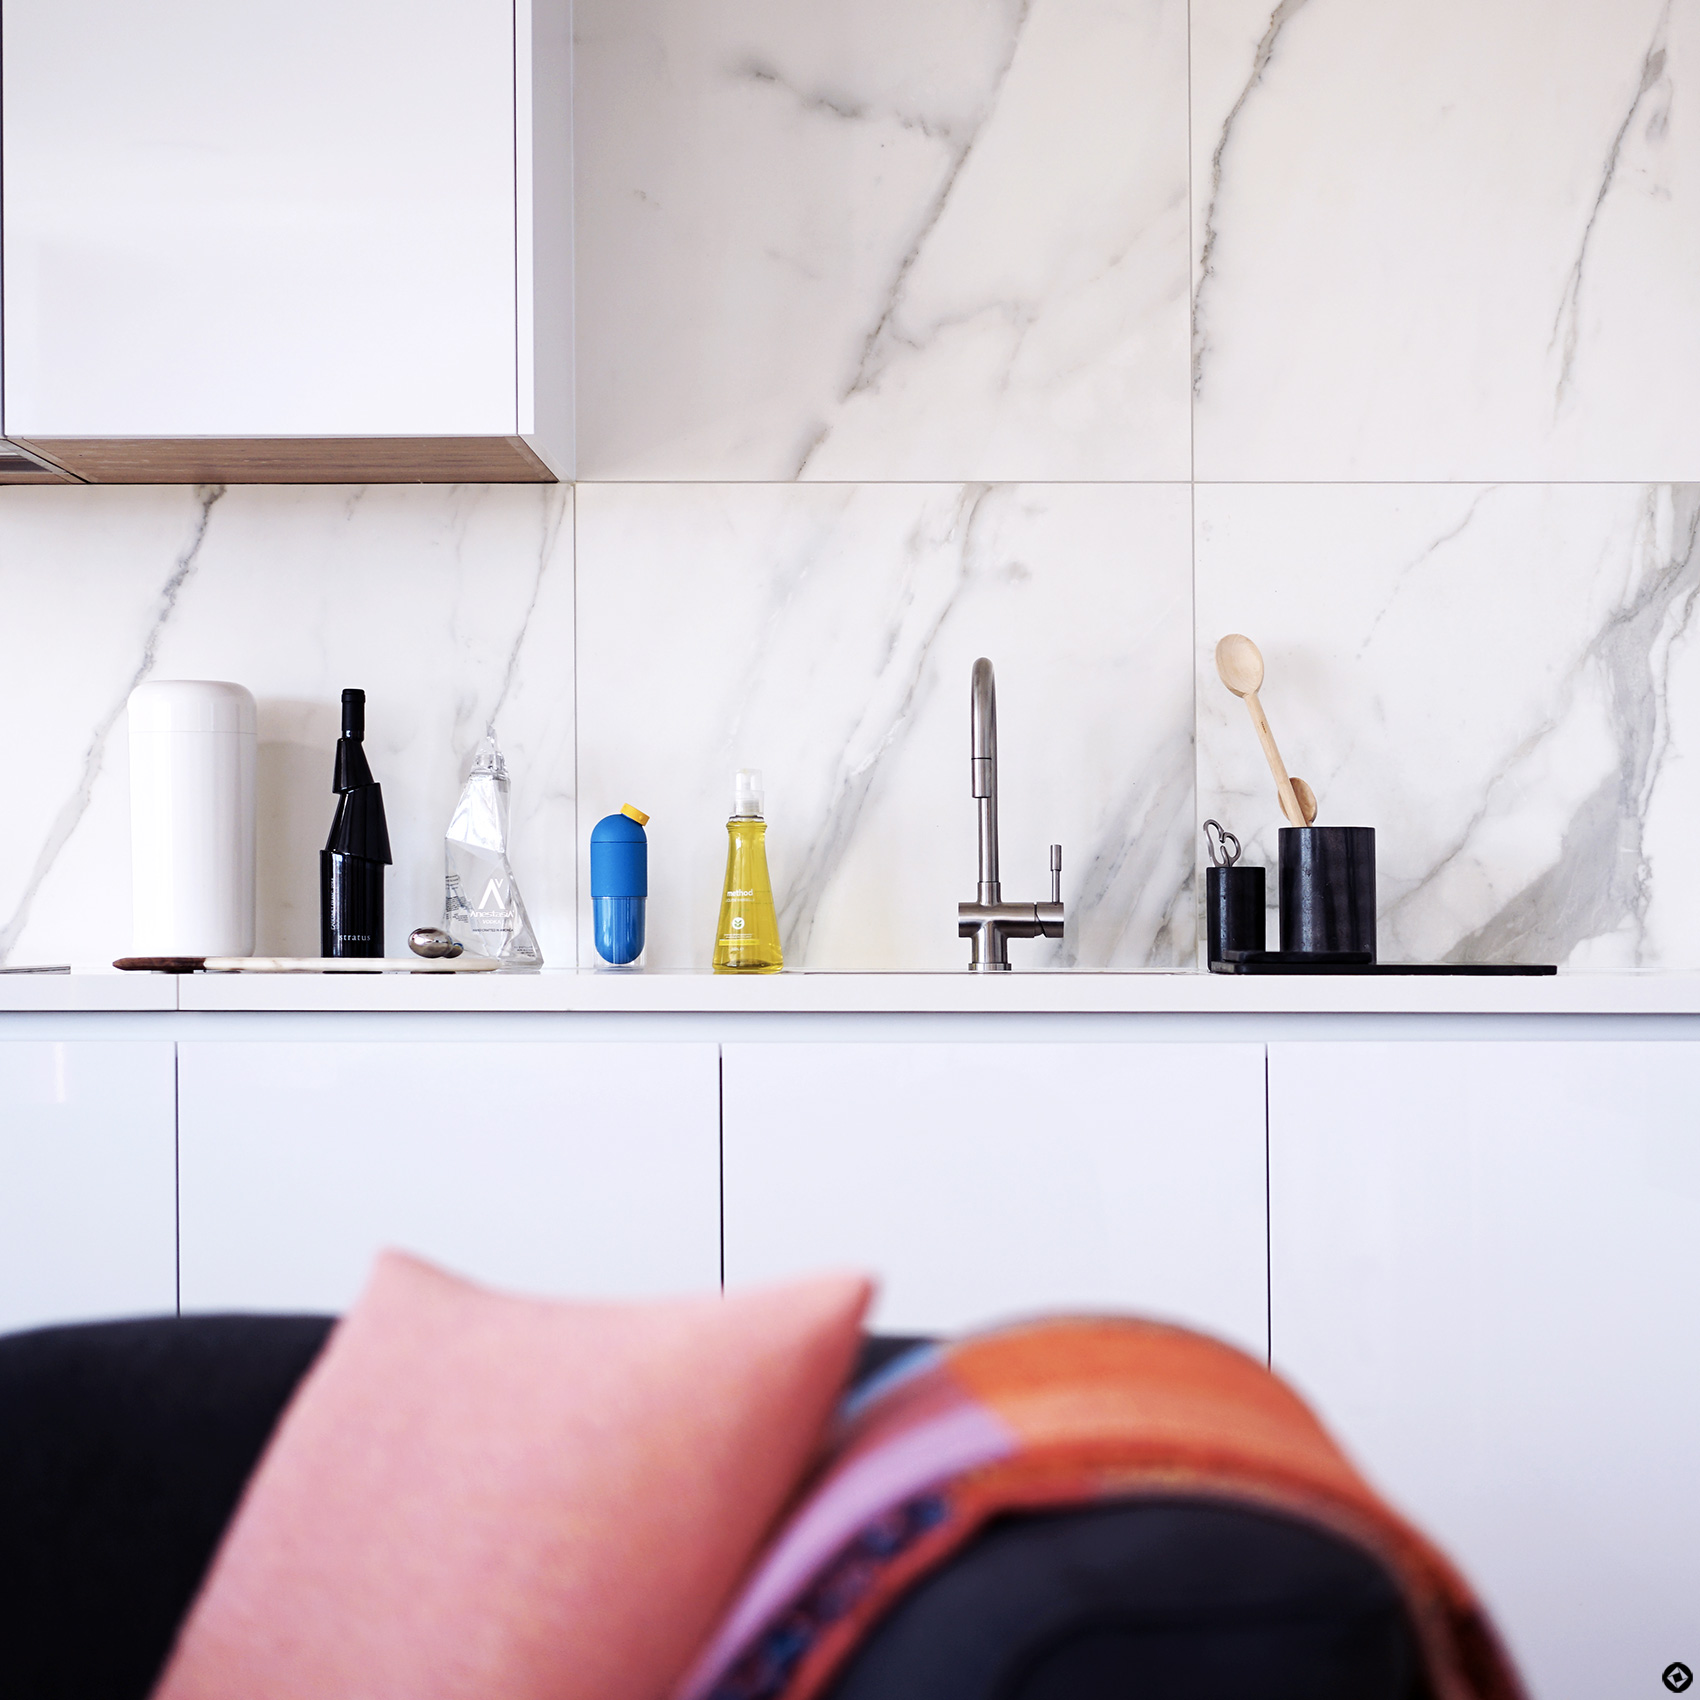 joyanahome2 cuisine sur mesure schmidt blog design jo yana. Black Bedroom Furniture Sets. Home Design Ideas